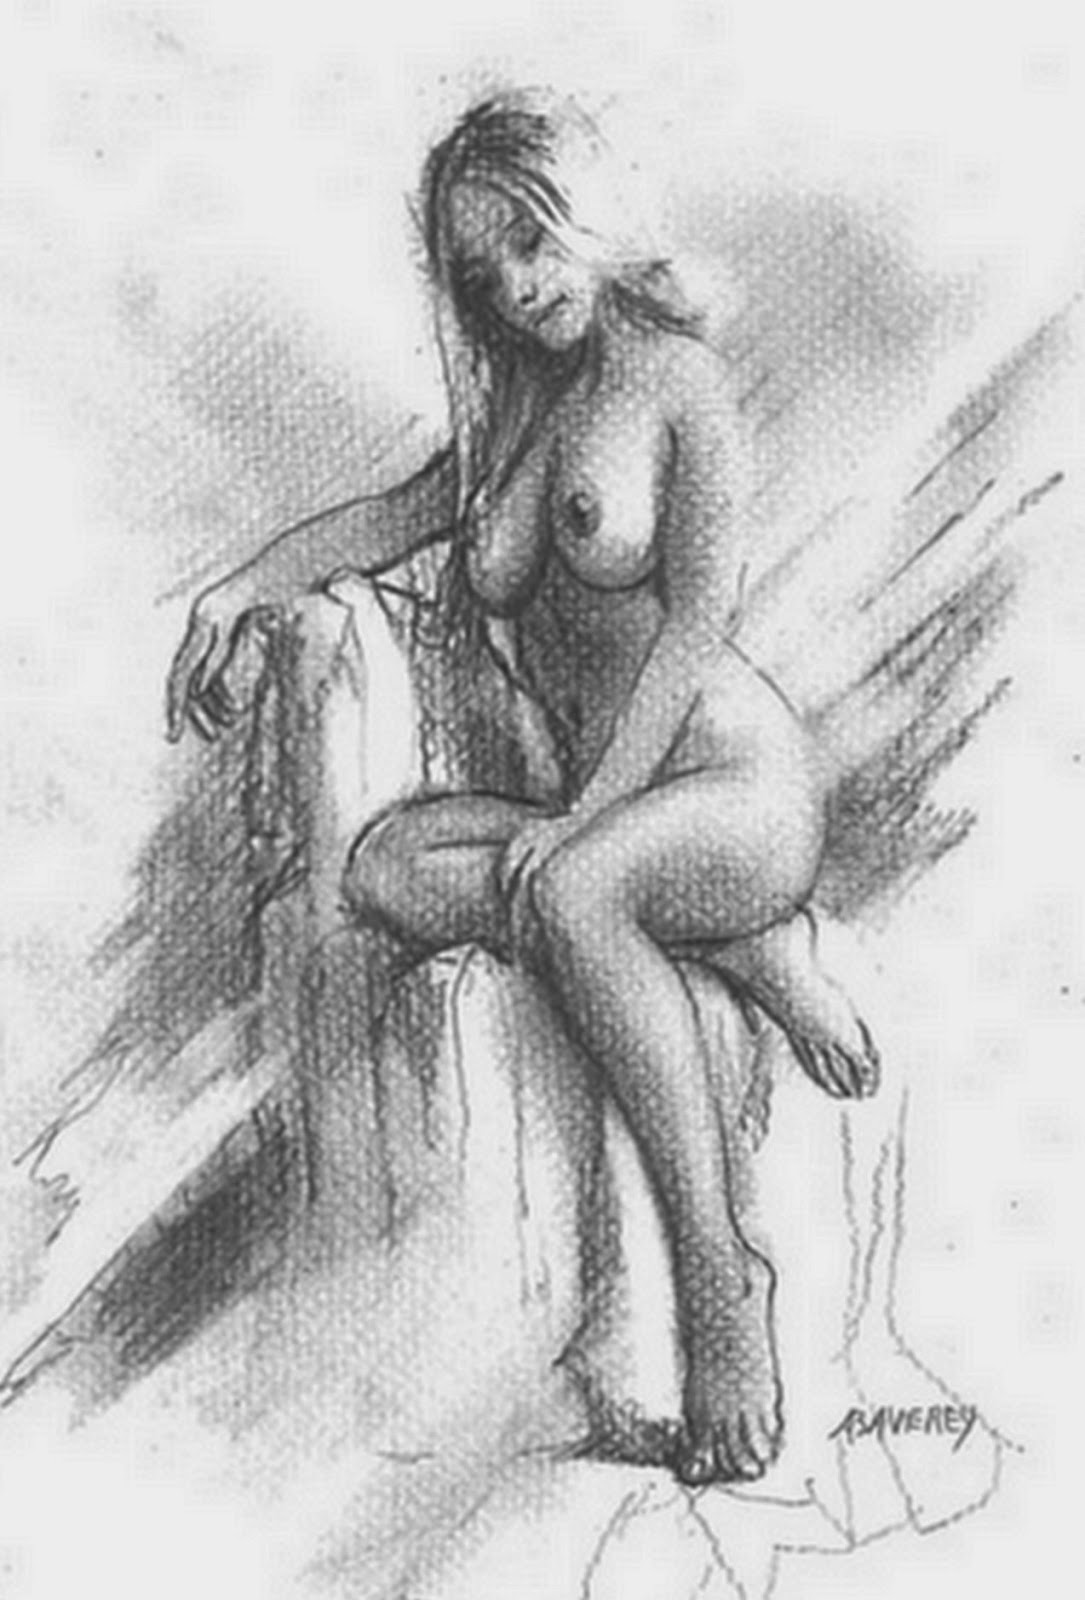 mujer-dibujo-a-lapiz